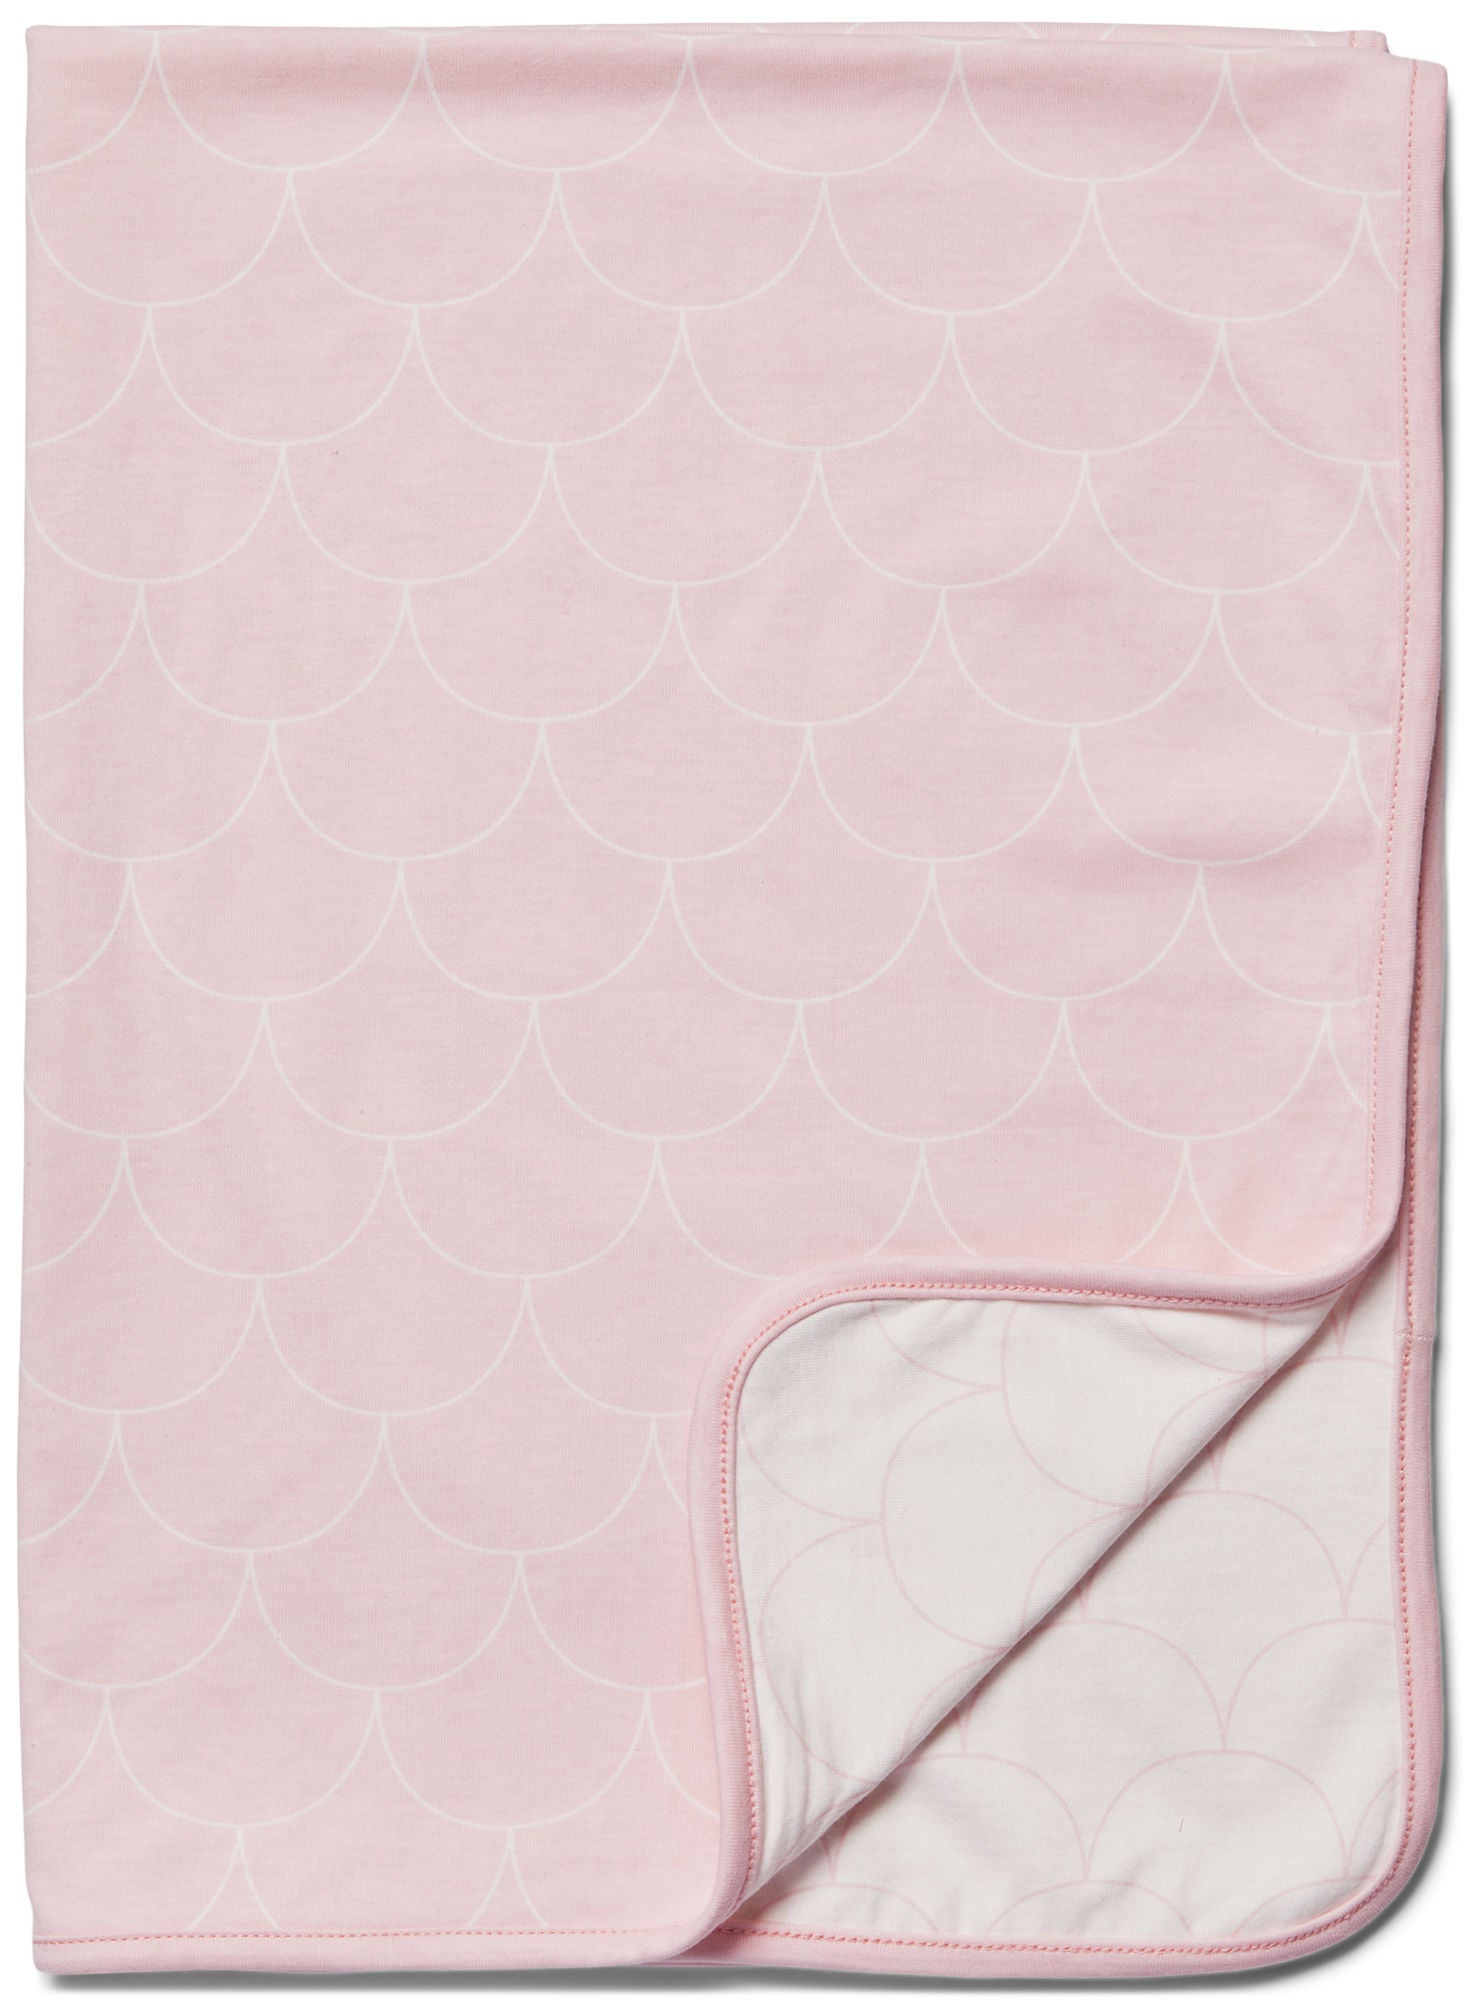 Minitude Scallop Filt, Chalk Pink/White